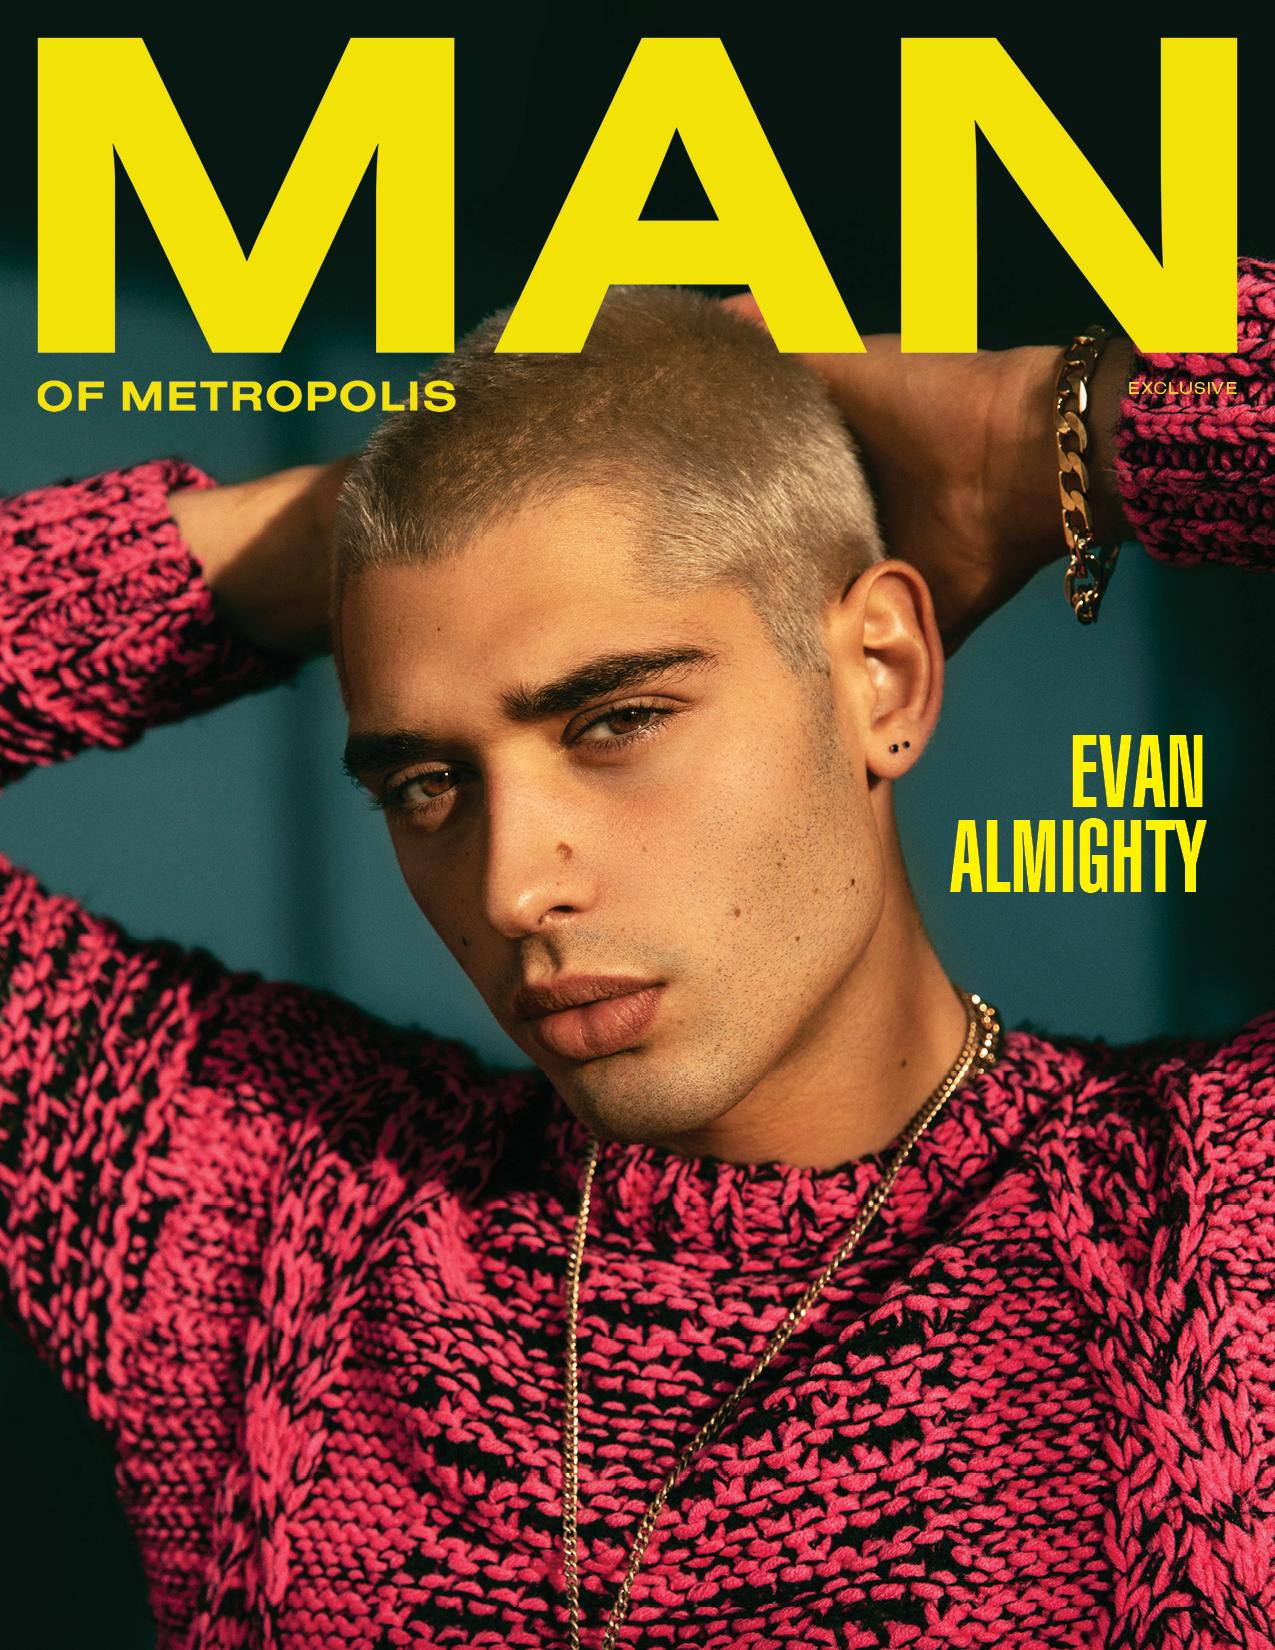 Evan Almighty - MAN of Metropolis